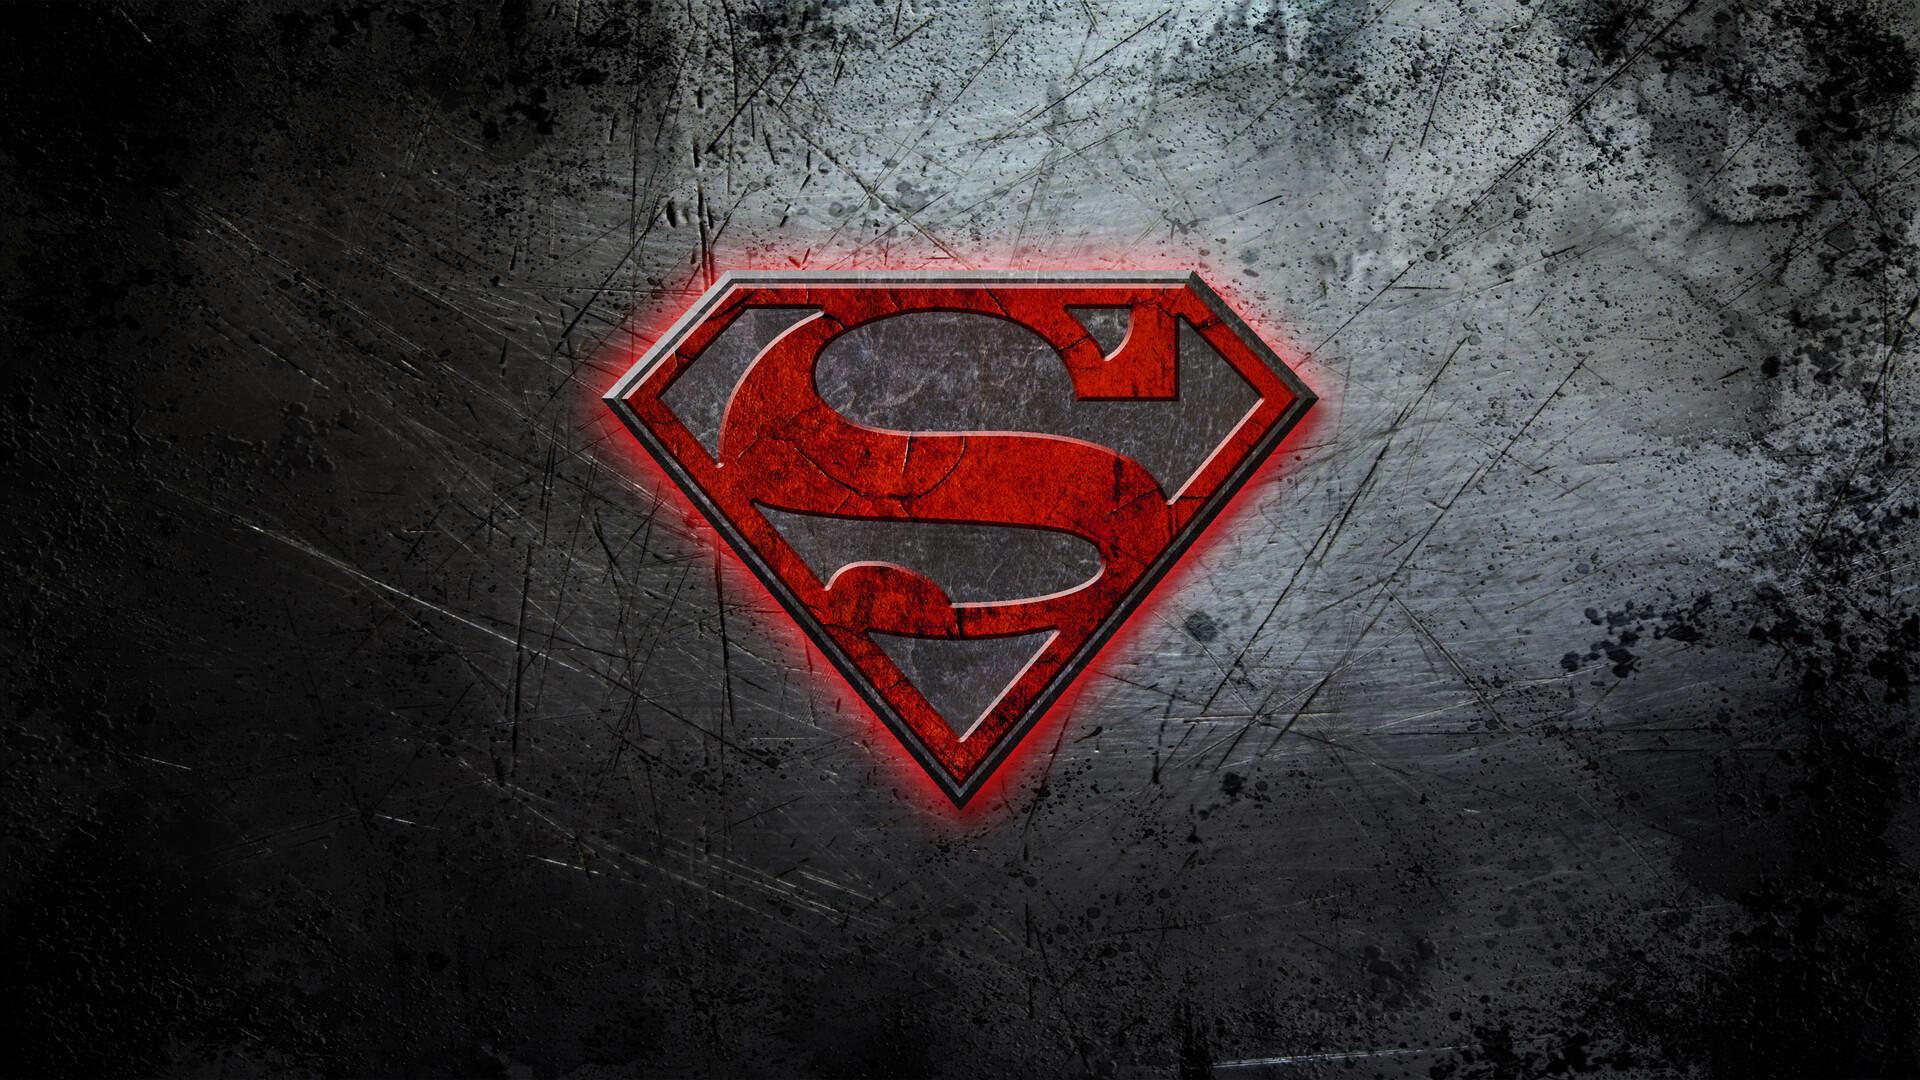 1920x1080 superman logo 4k laptop full hd 1080p hd 4k wallpapers superman logo 4k 0fg voltagebd Choice Image